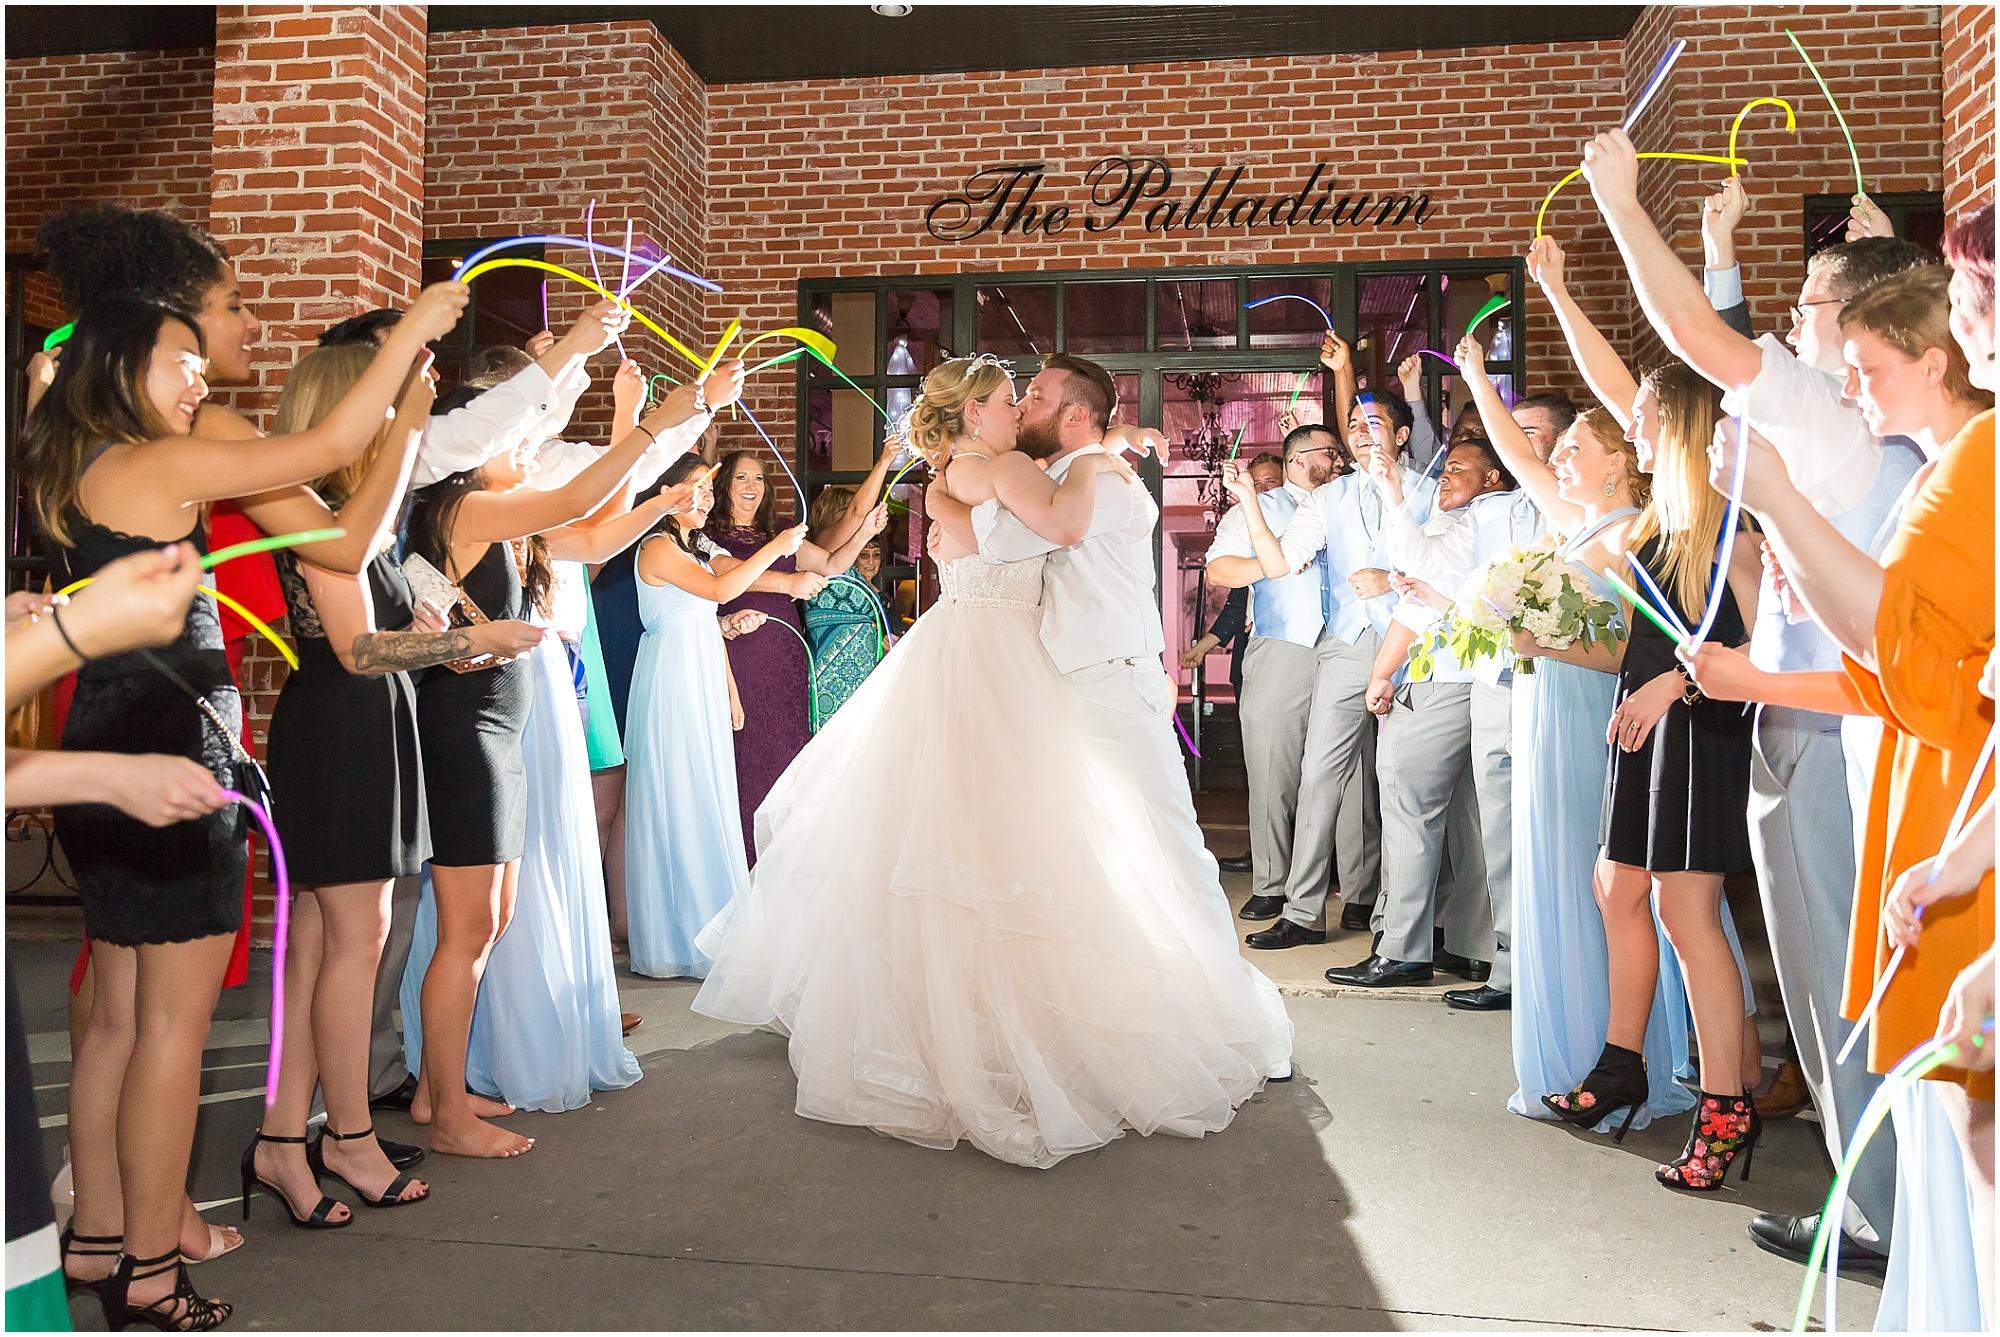 Wedding at The Palladium in downtown Waco - www.jasonandmelaina.com